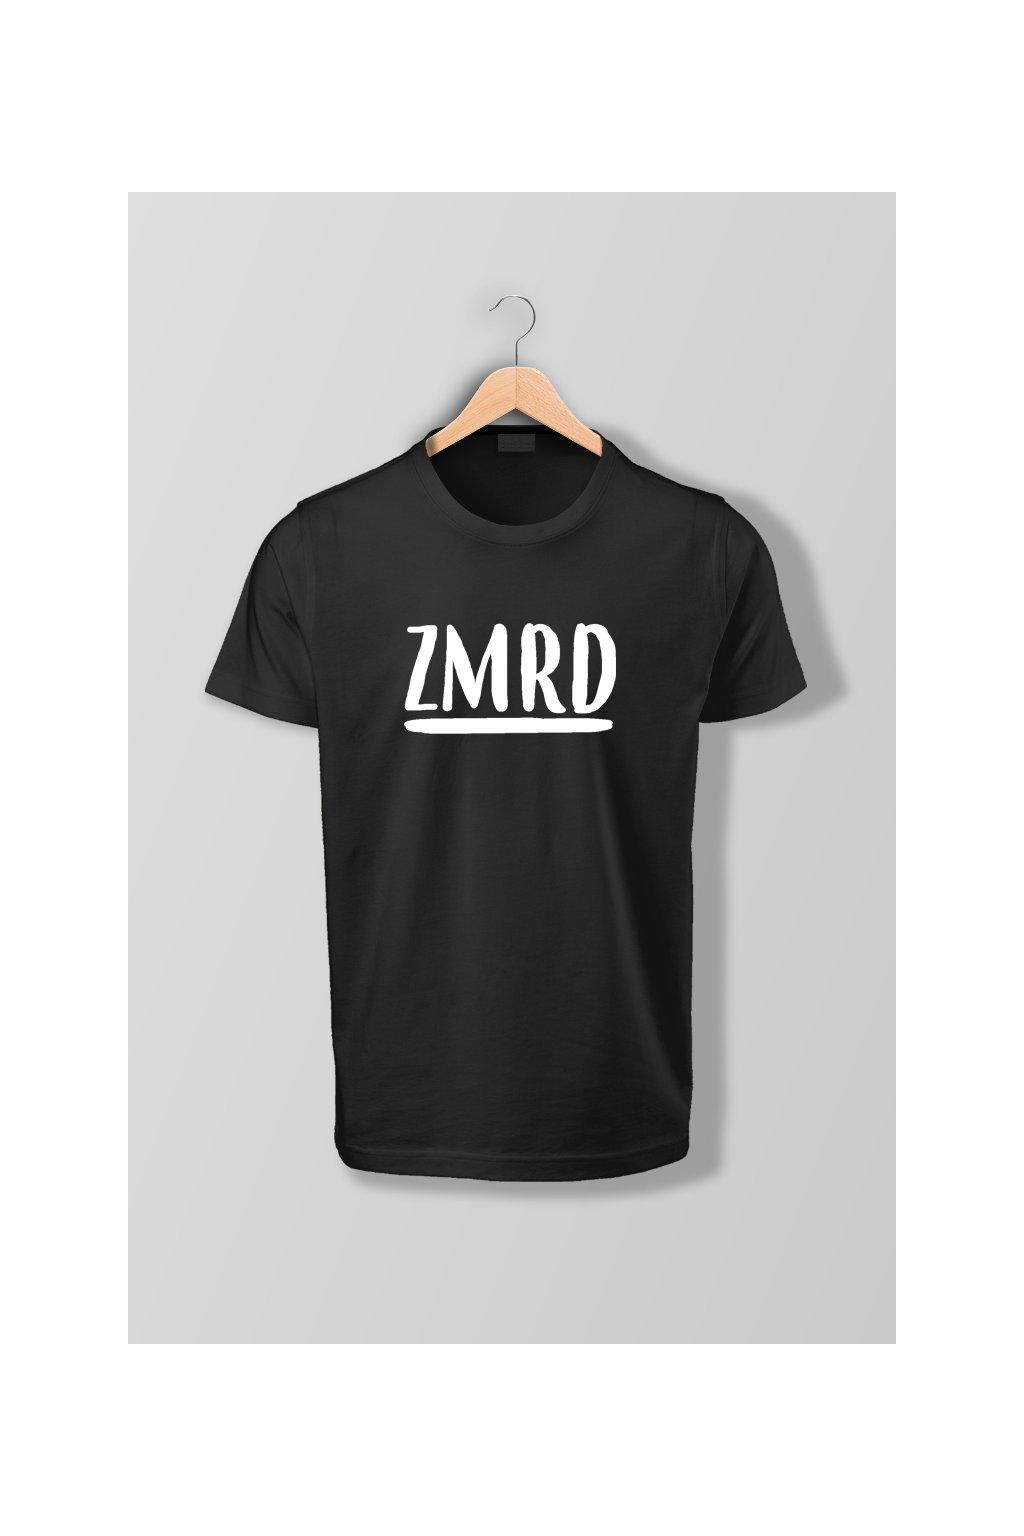 Pánské tričko ZMRD